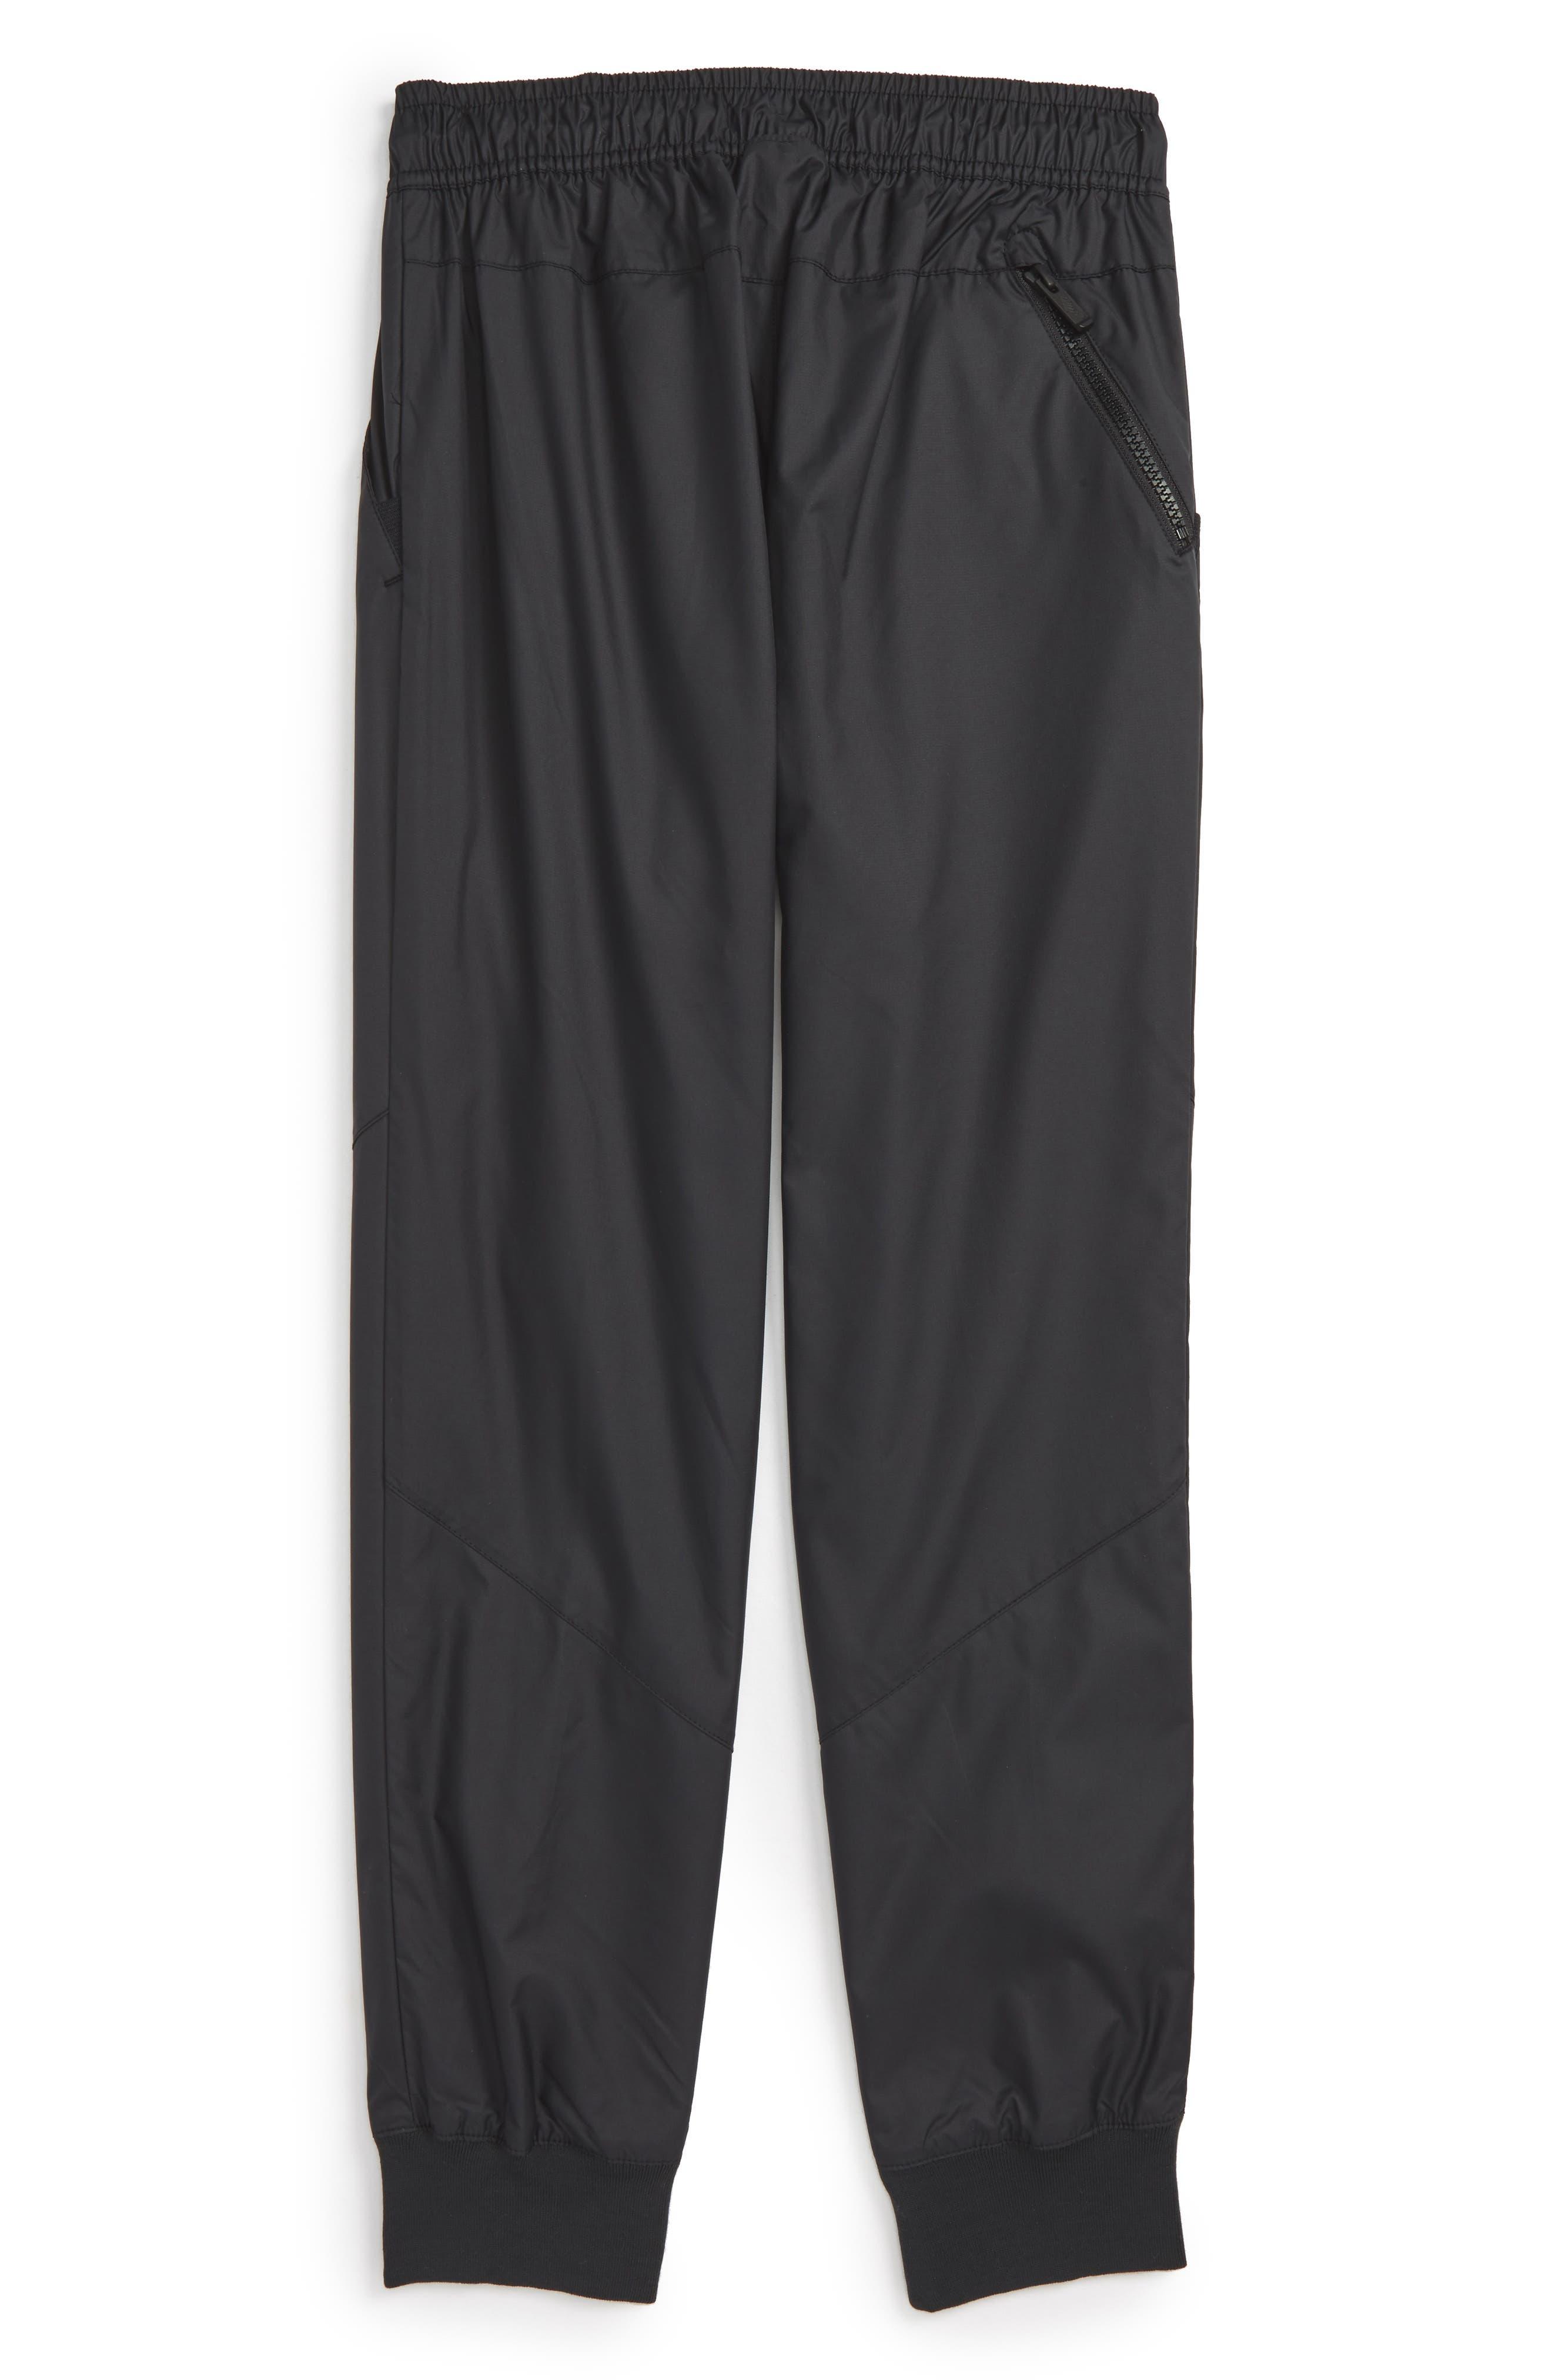 Sportswear Water Resistant Pants,                             Alternate thumbnail 2, color,                             010